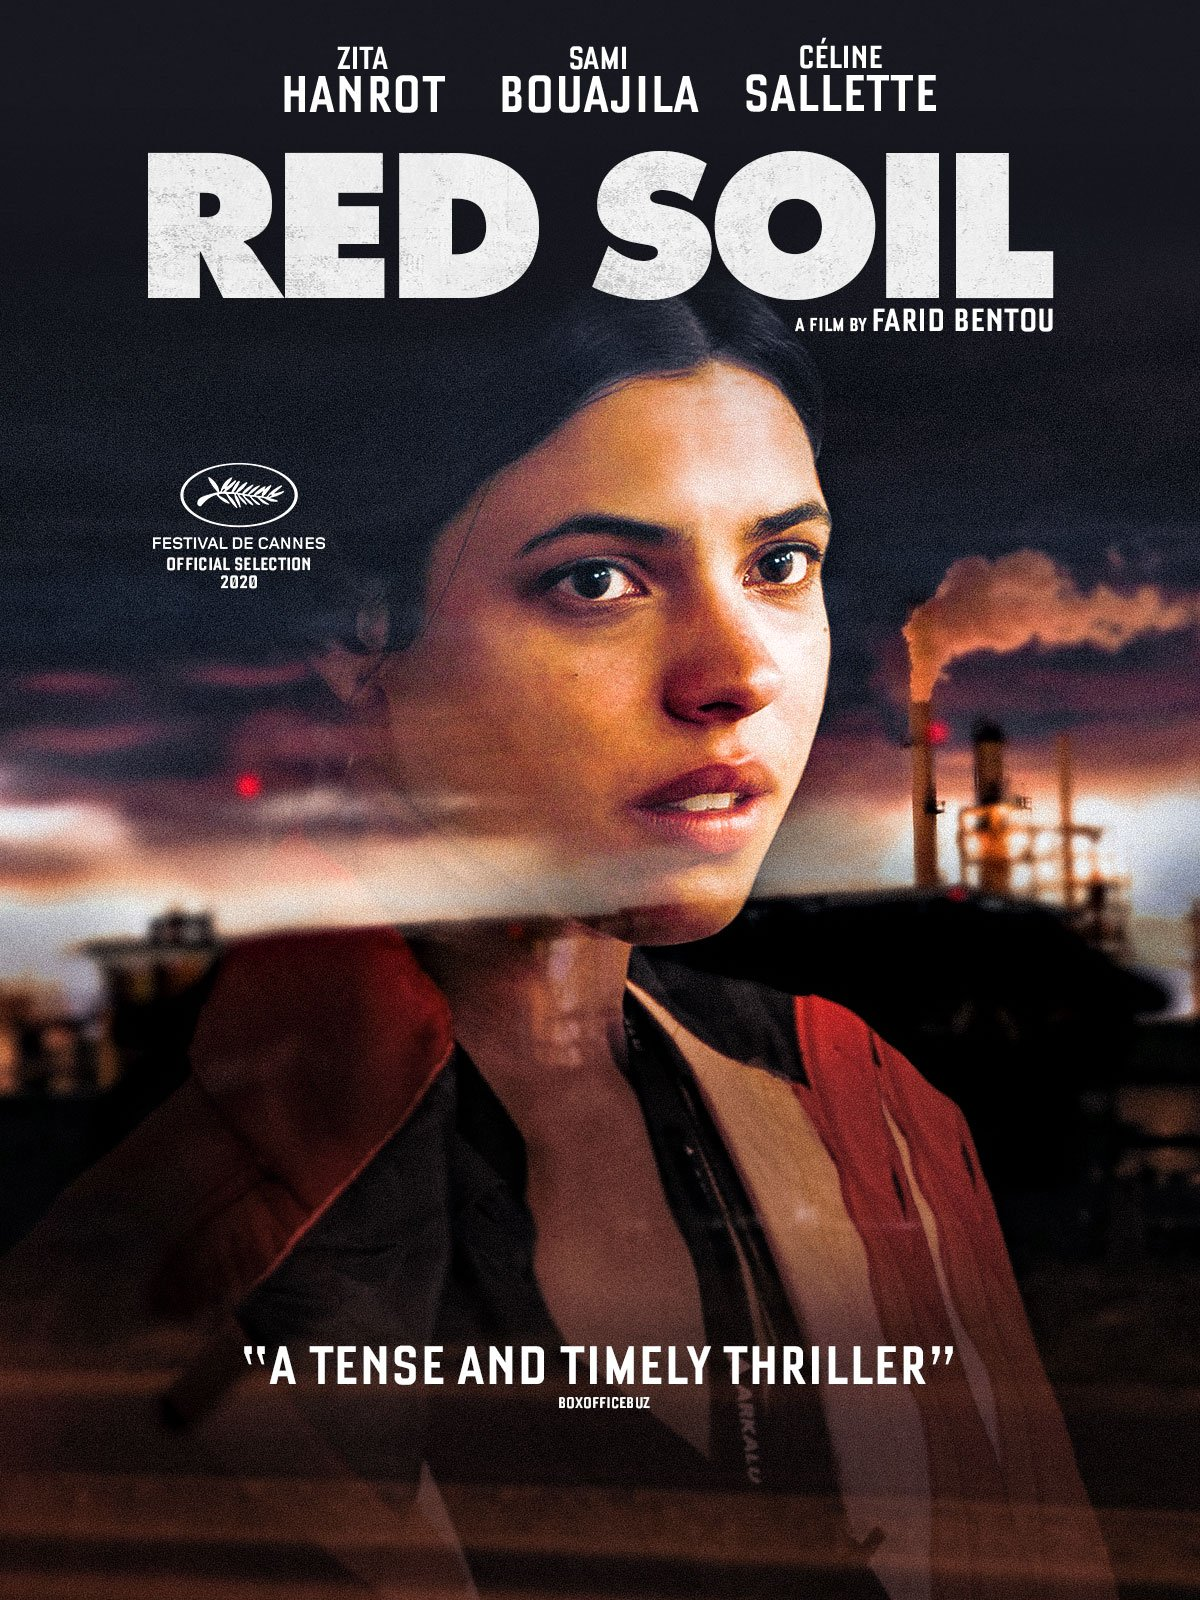 Red Soil (Signautre Entertainment) Artwork